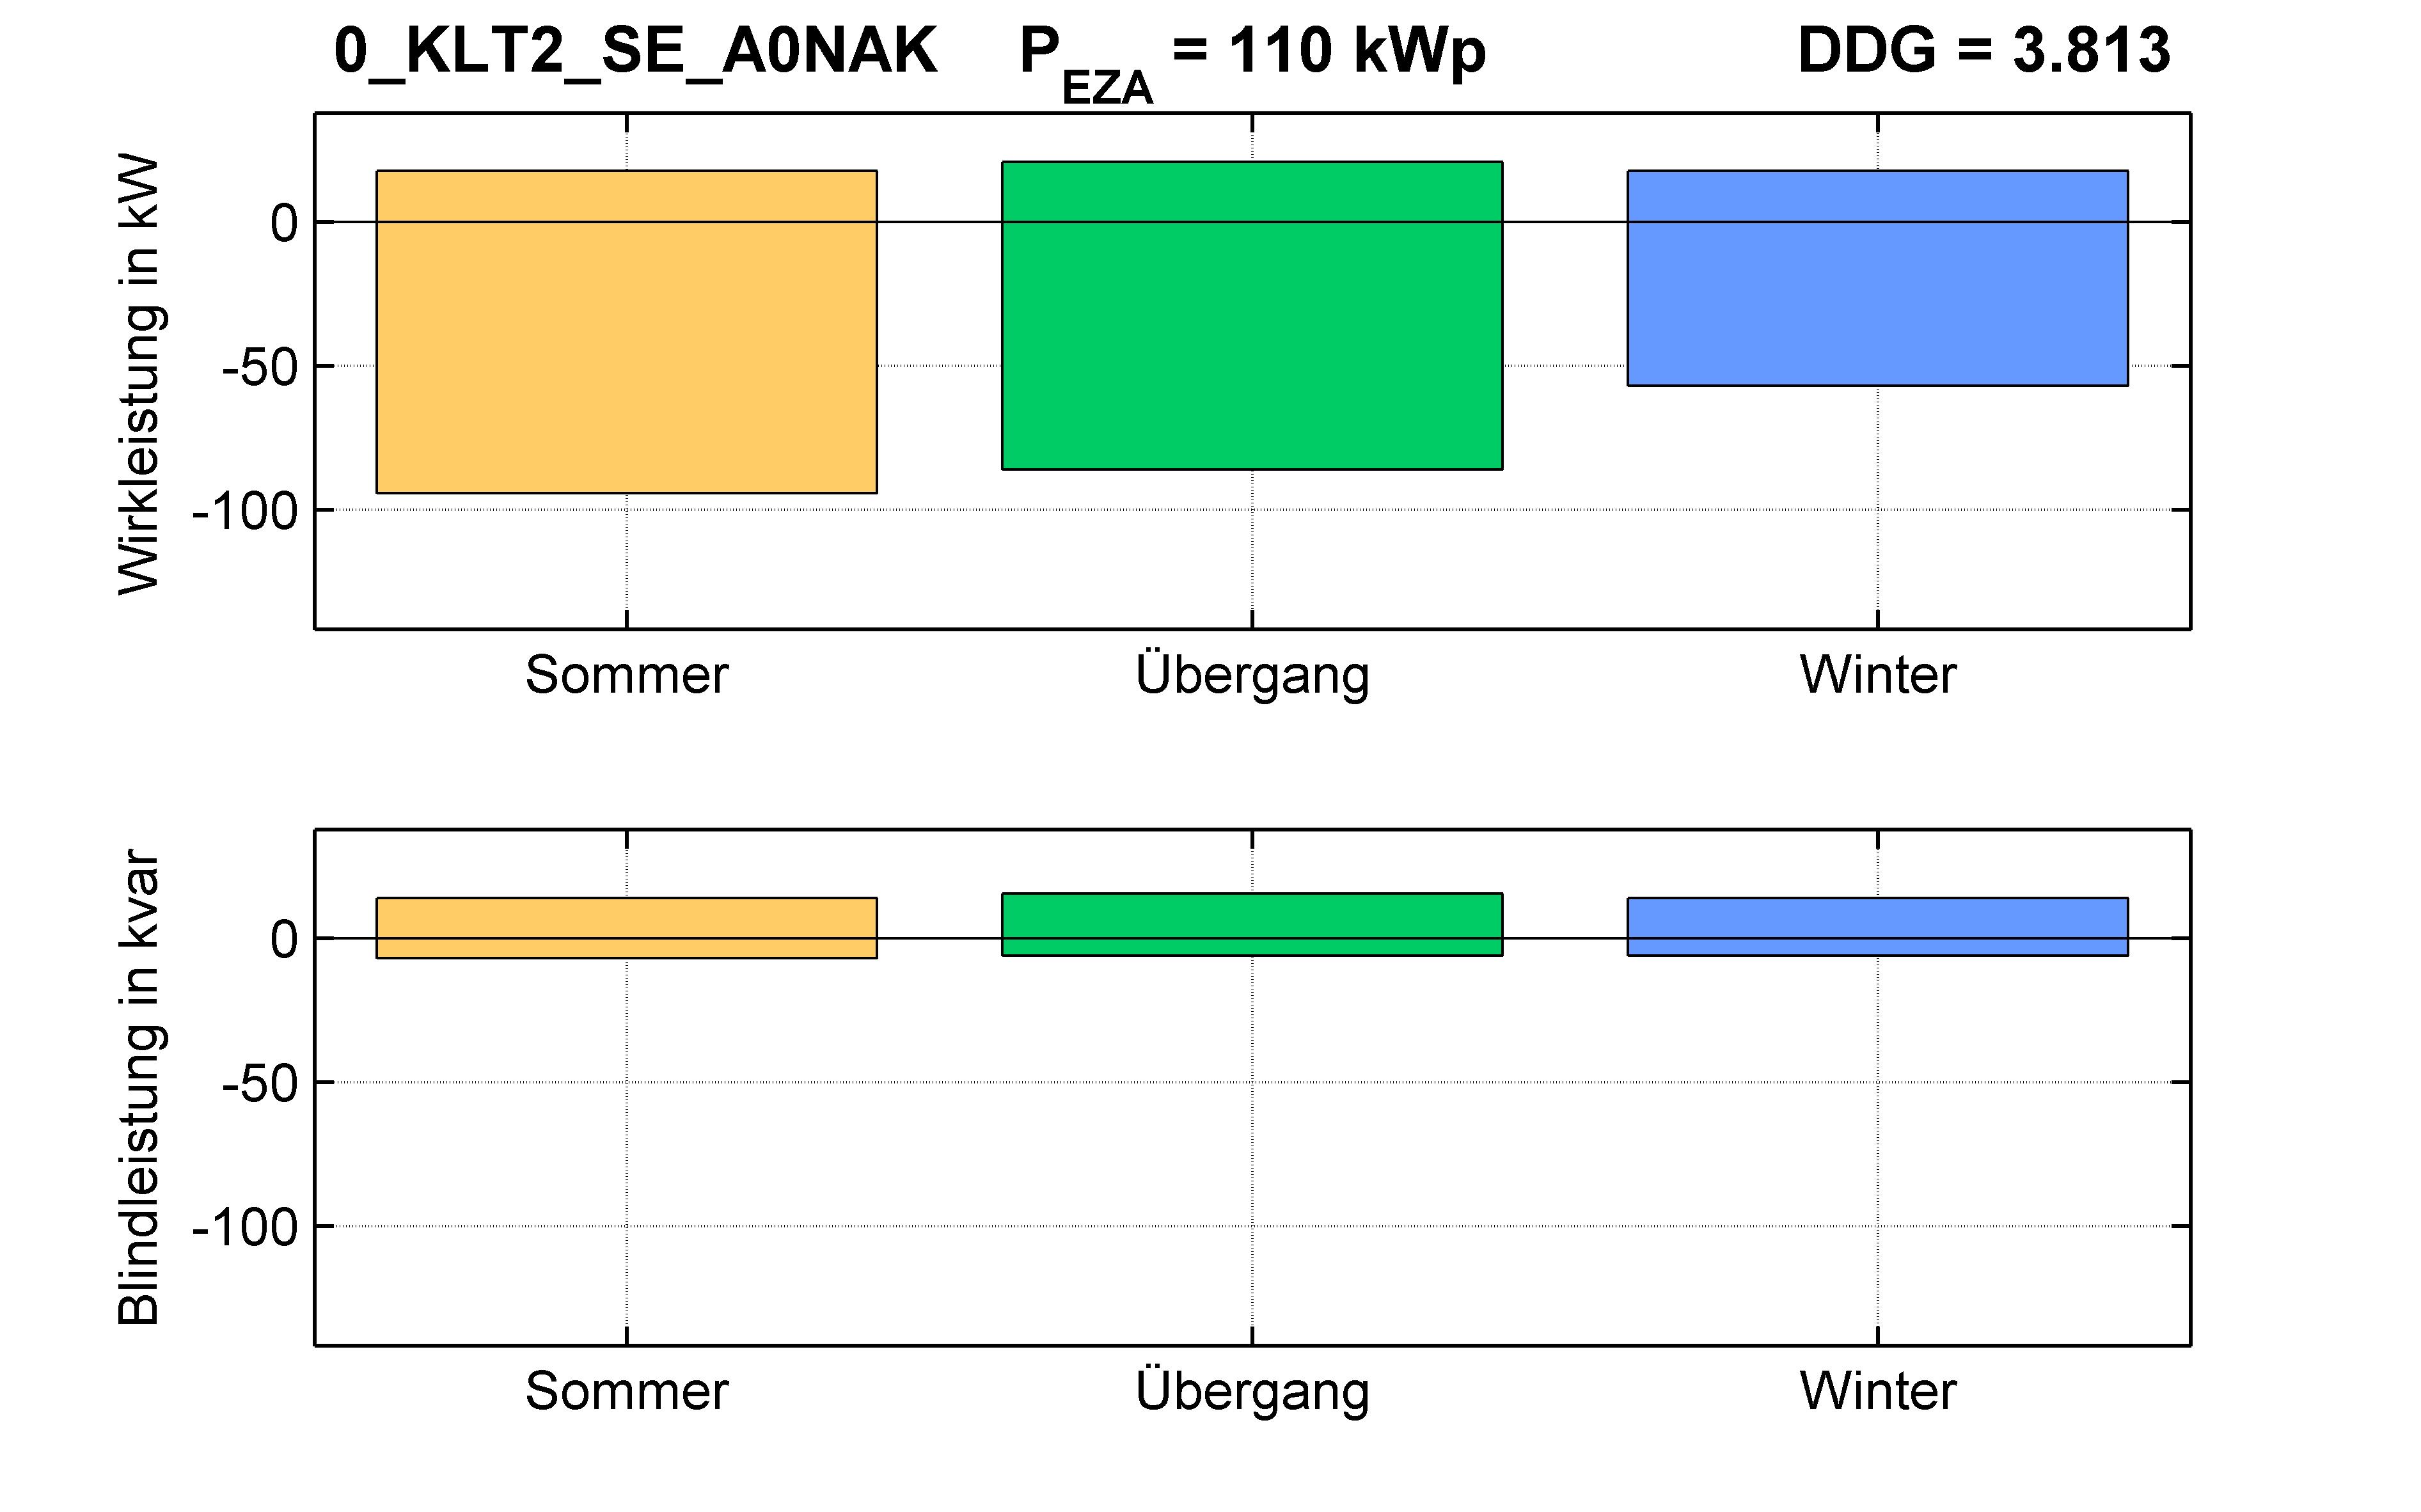 KLT2 | RONT (SE) A0NAK | PQ-Bilanz